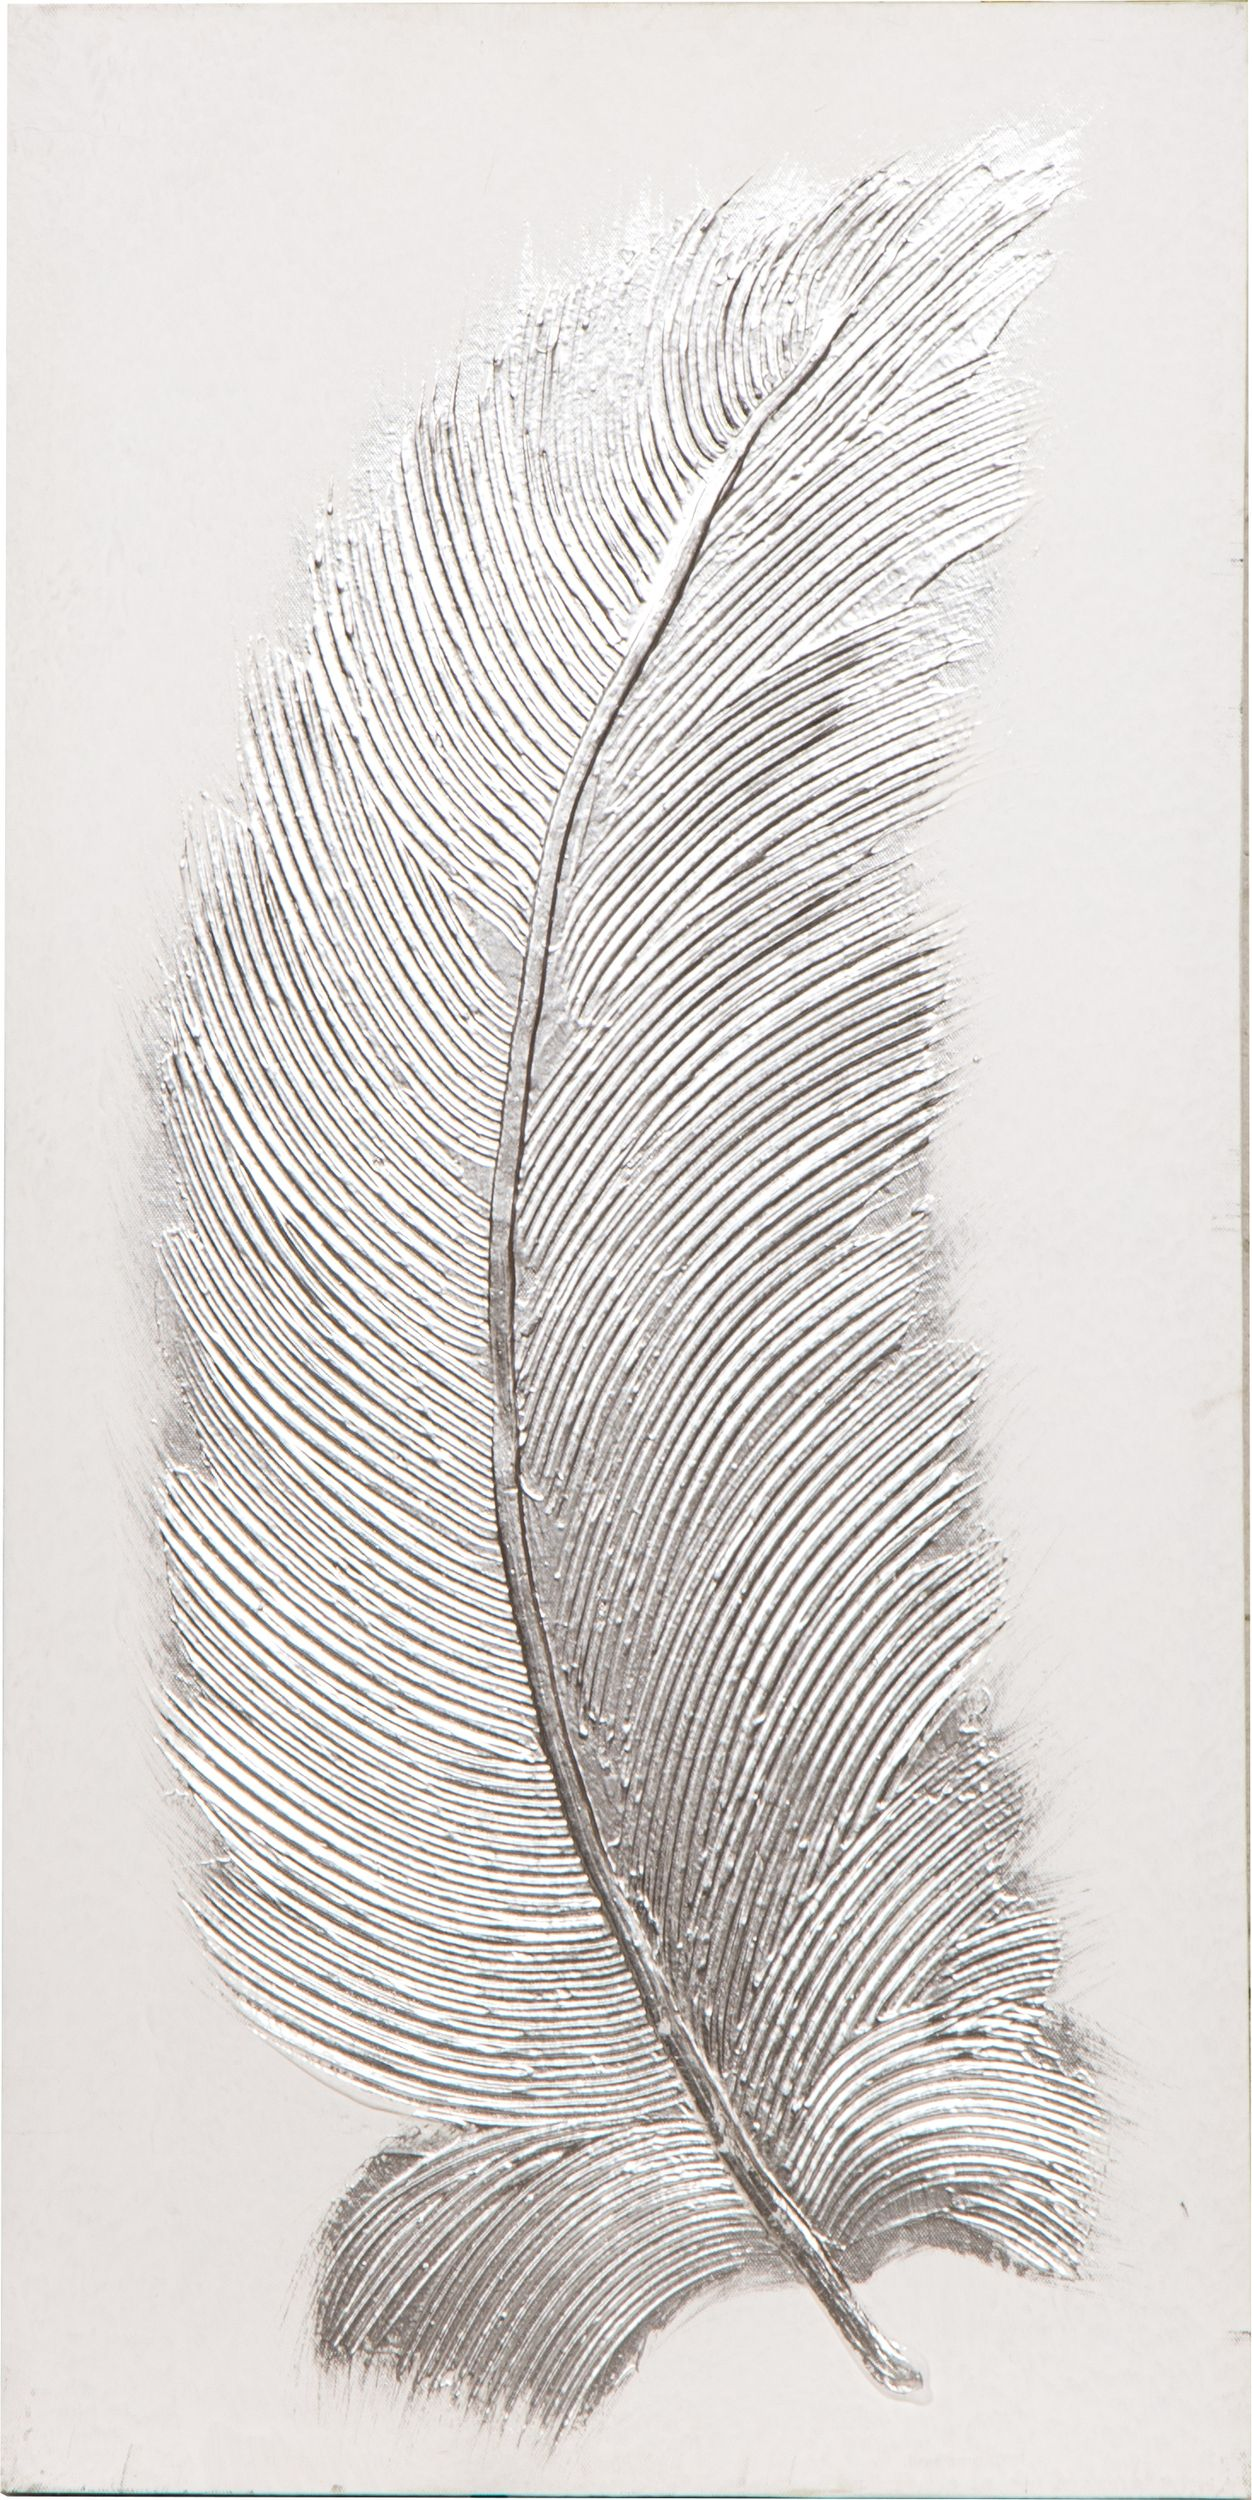 Leinwandbild 40x80cm ORIGINAL NESTO, BLUME